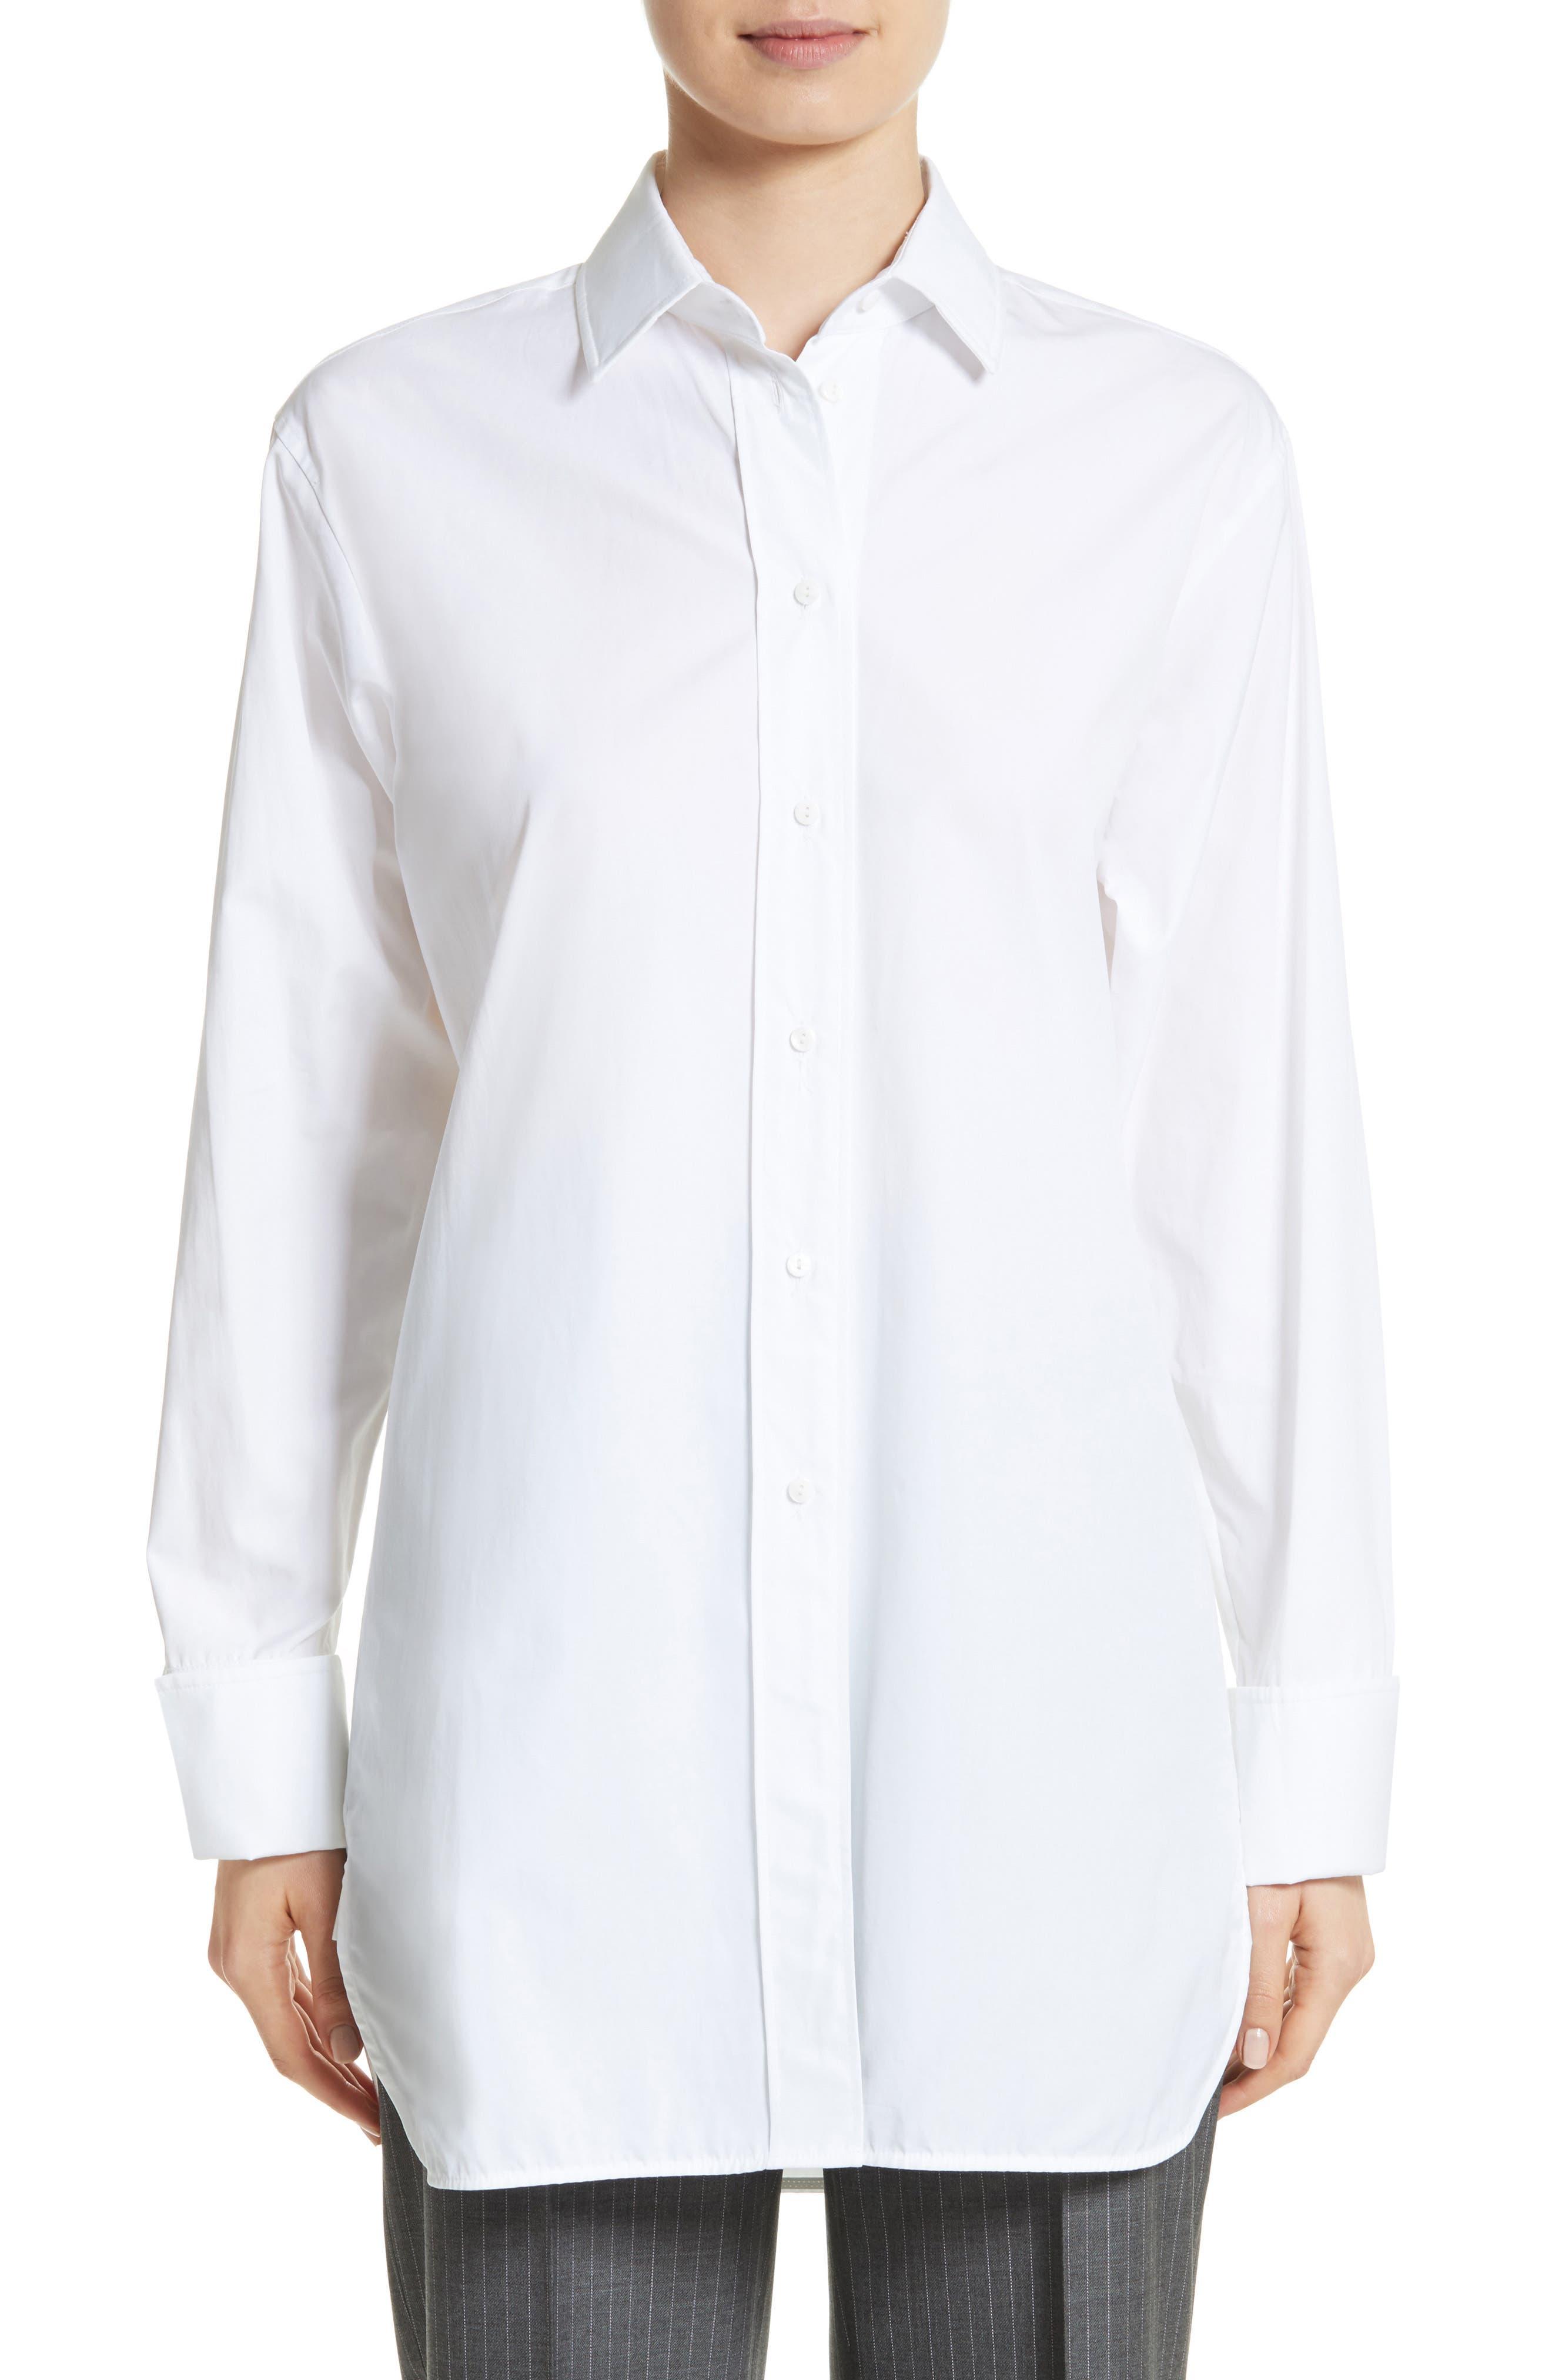 Visivo Cotton Poplin Shirt,                         Main,                         color, 101